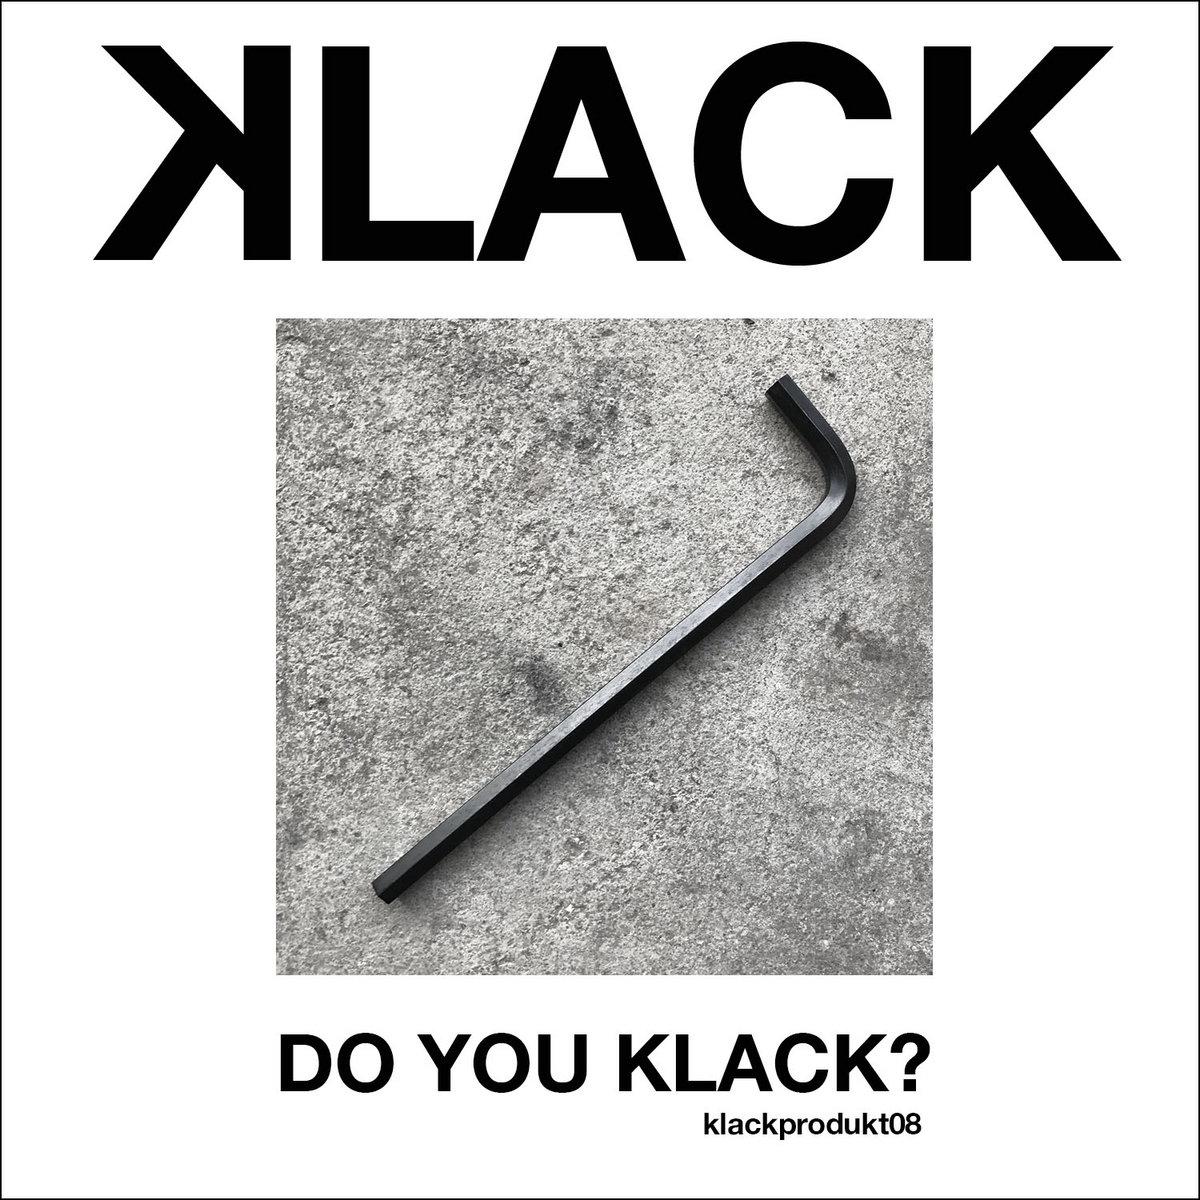 Dmf klack from do you klack by klack negle Image collections